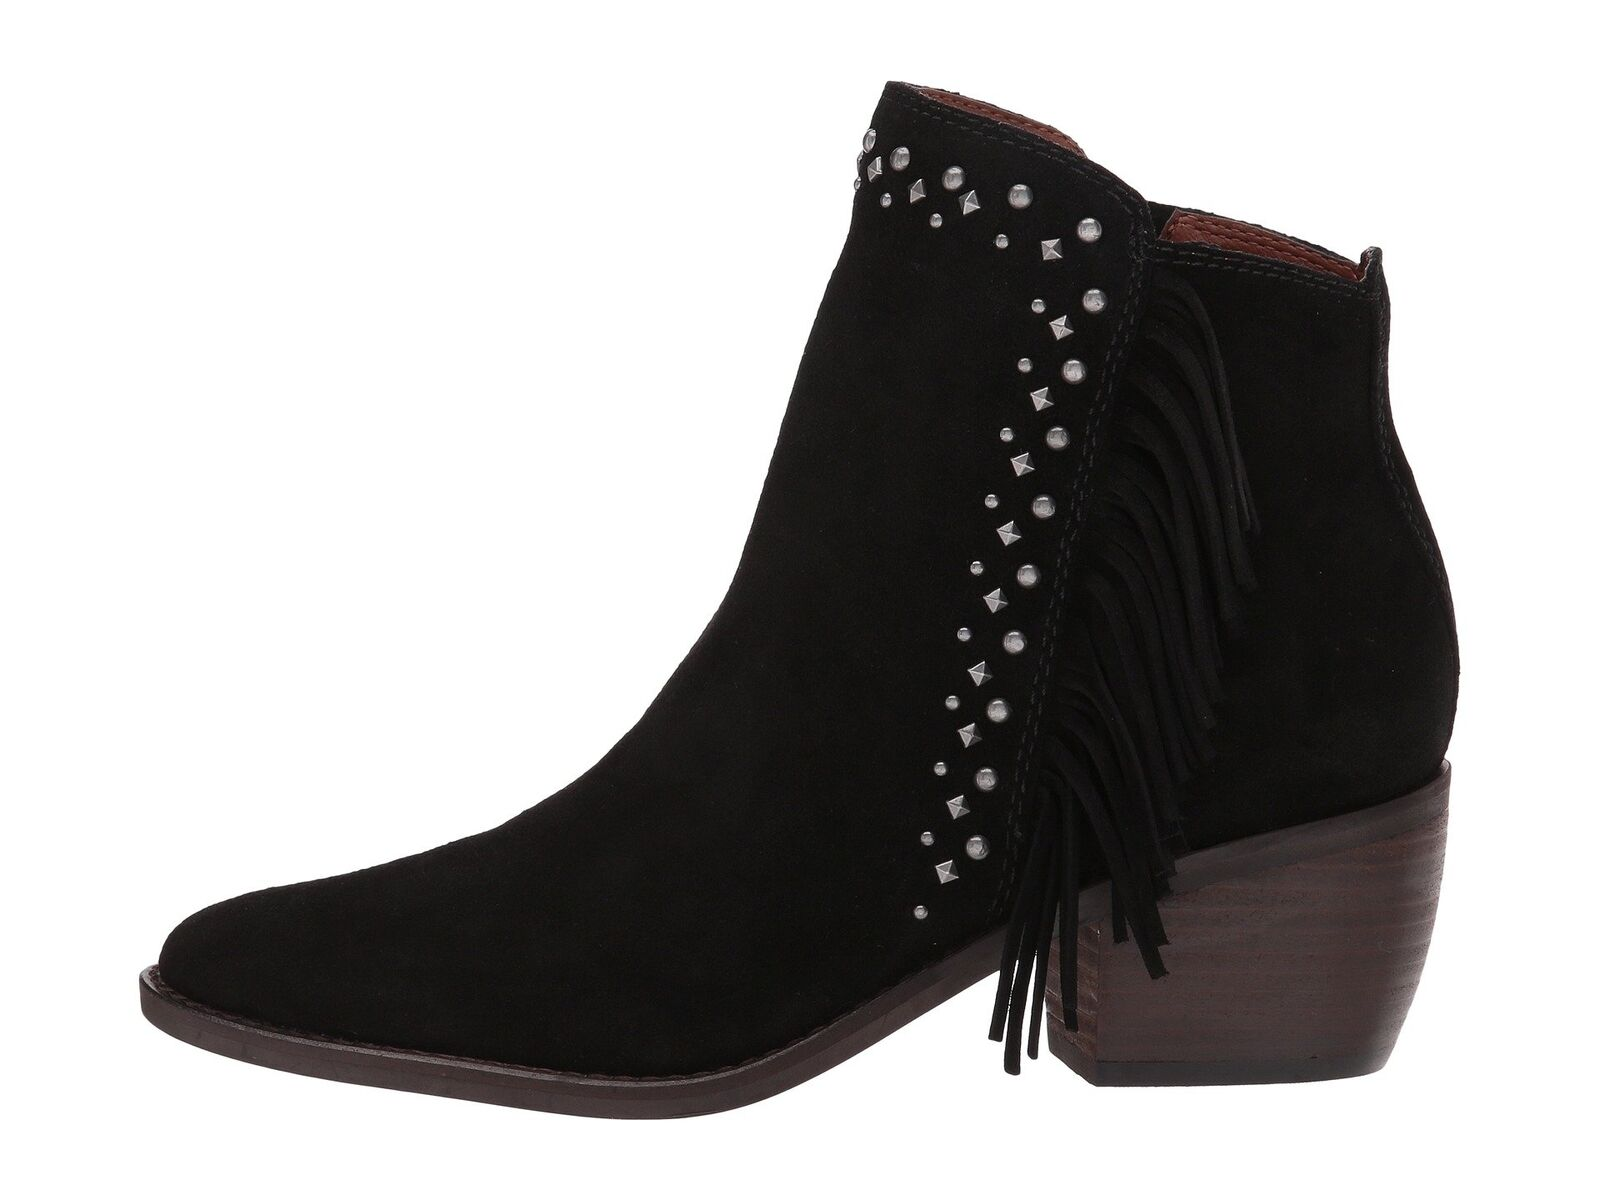 Lucky Wouomo LK-KAARFINA Fashion avvio nero OIL SUEDE